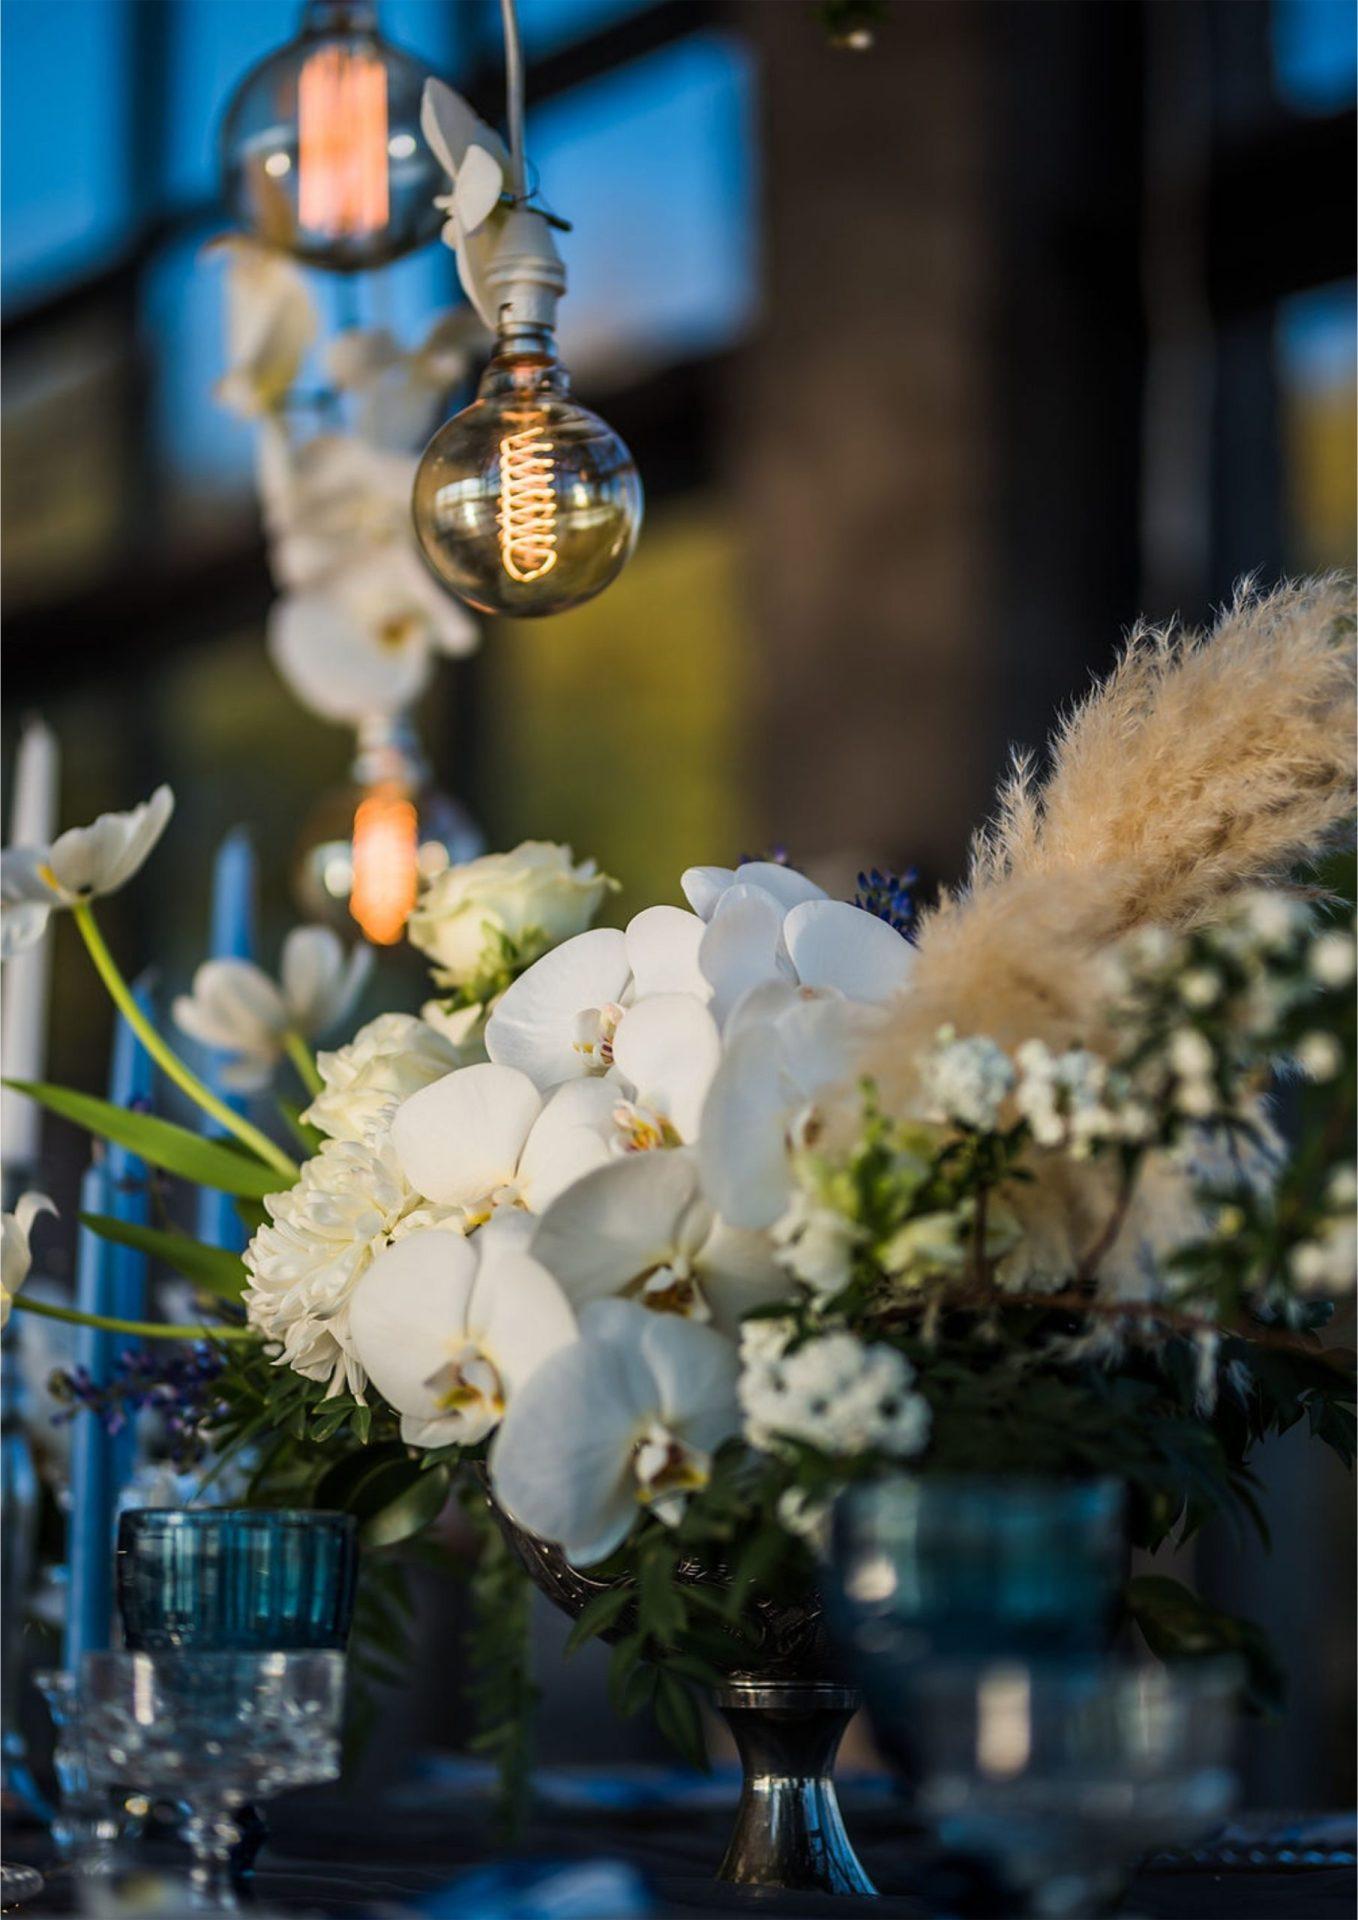 Bruidsgids Wedding Guide My Pretty Vintage Romantic Wedding Table Events Wedding Decor Photography by Gustav Klotz